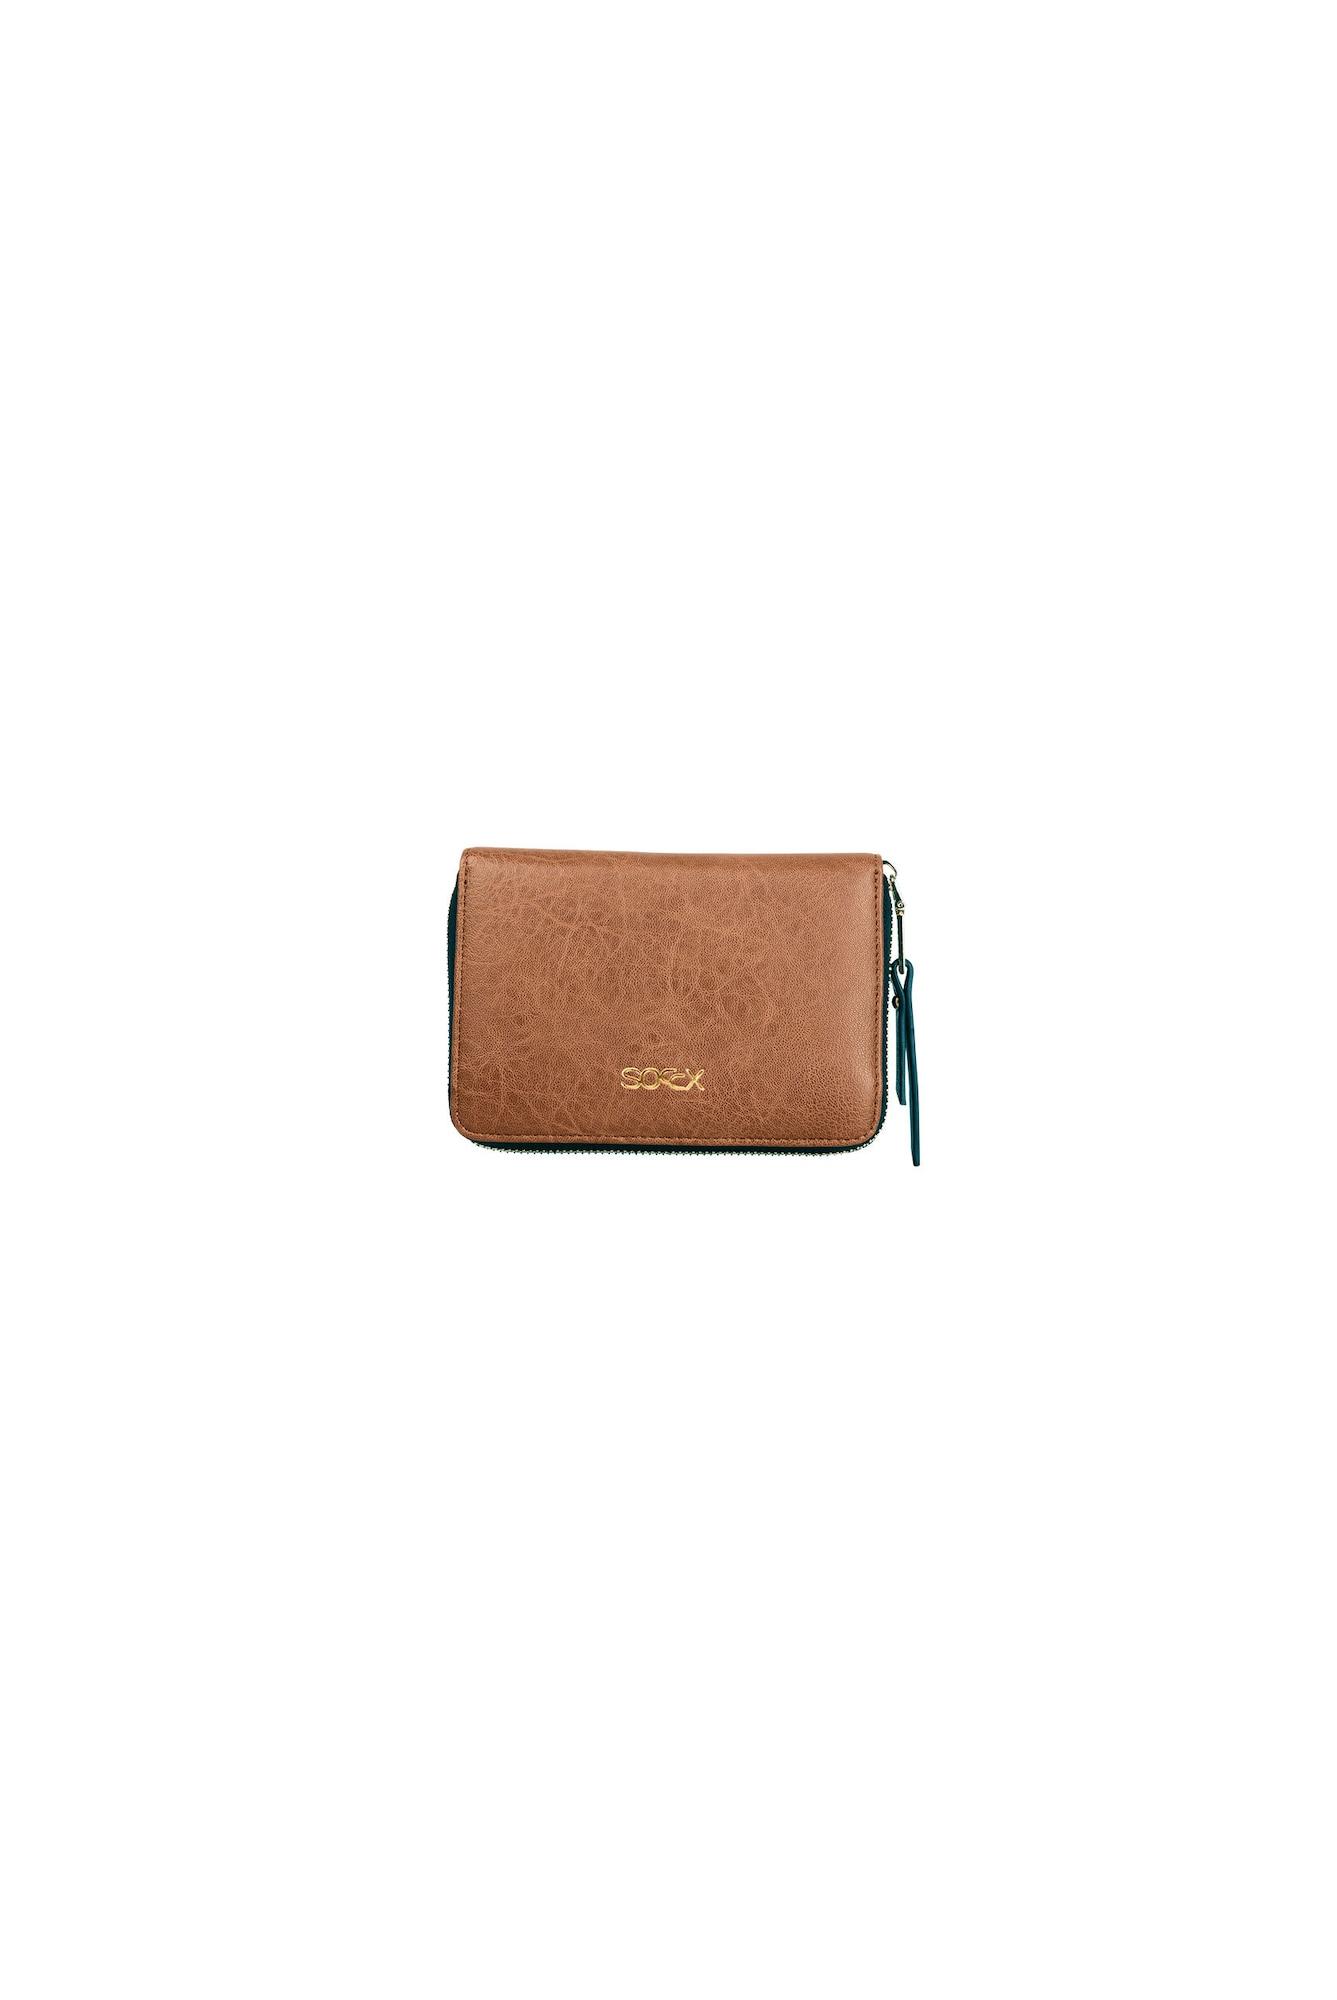 Portemonnaie | Accessoires > Portemonnaies | Braun | Soccx